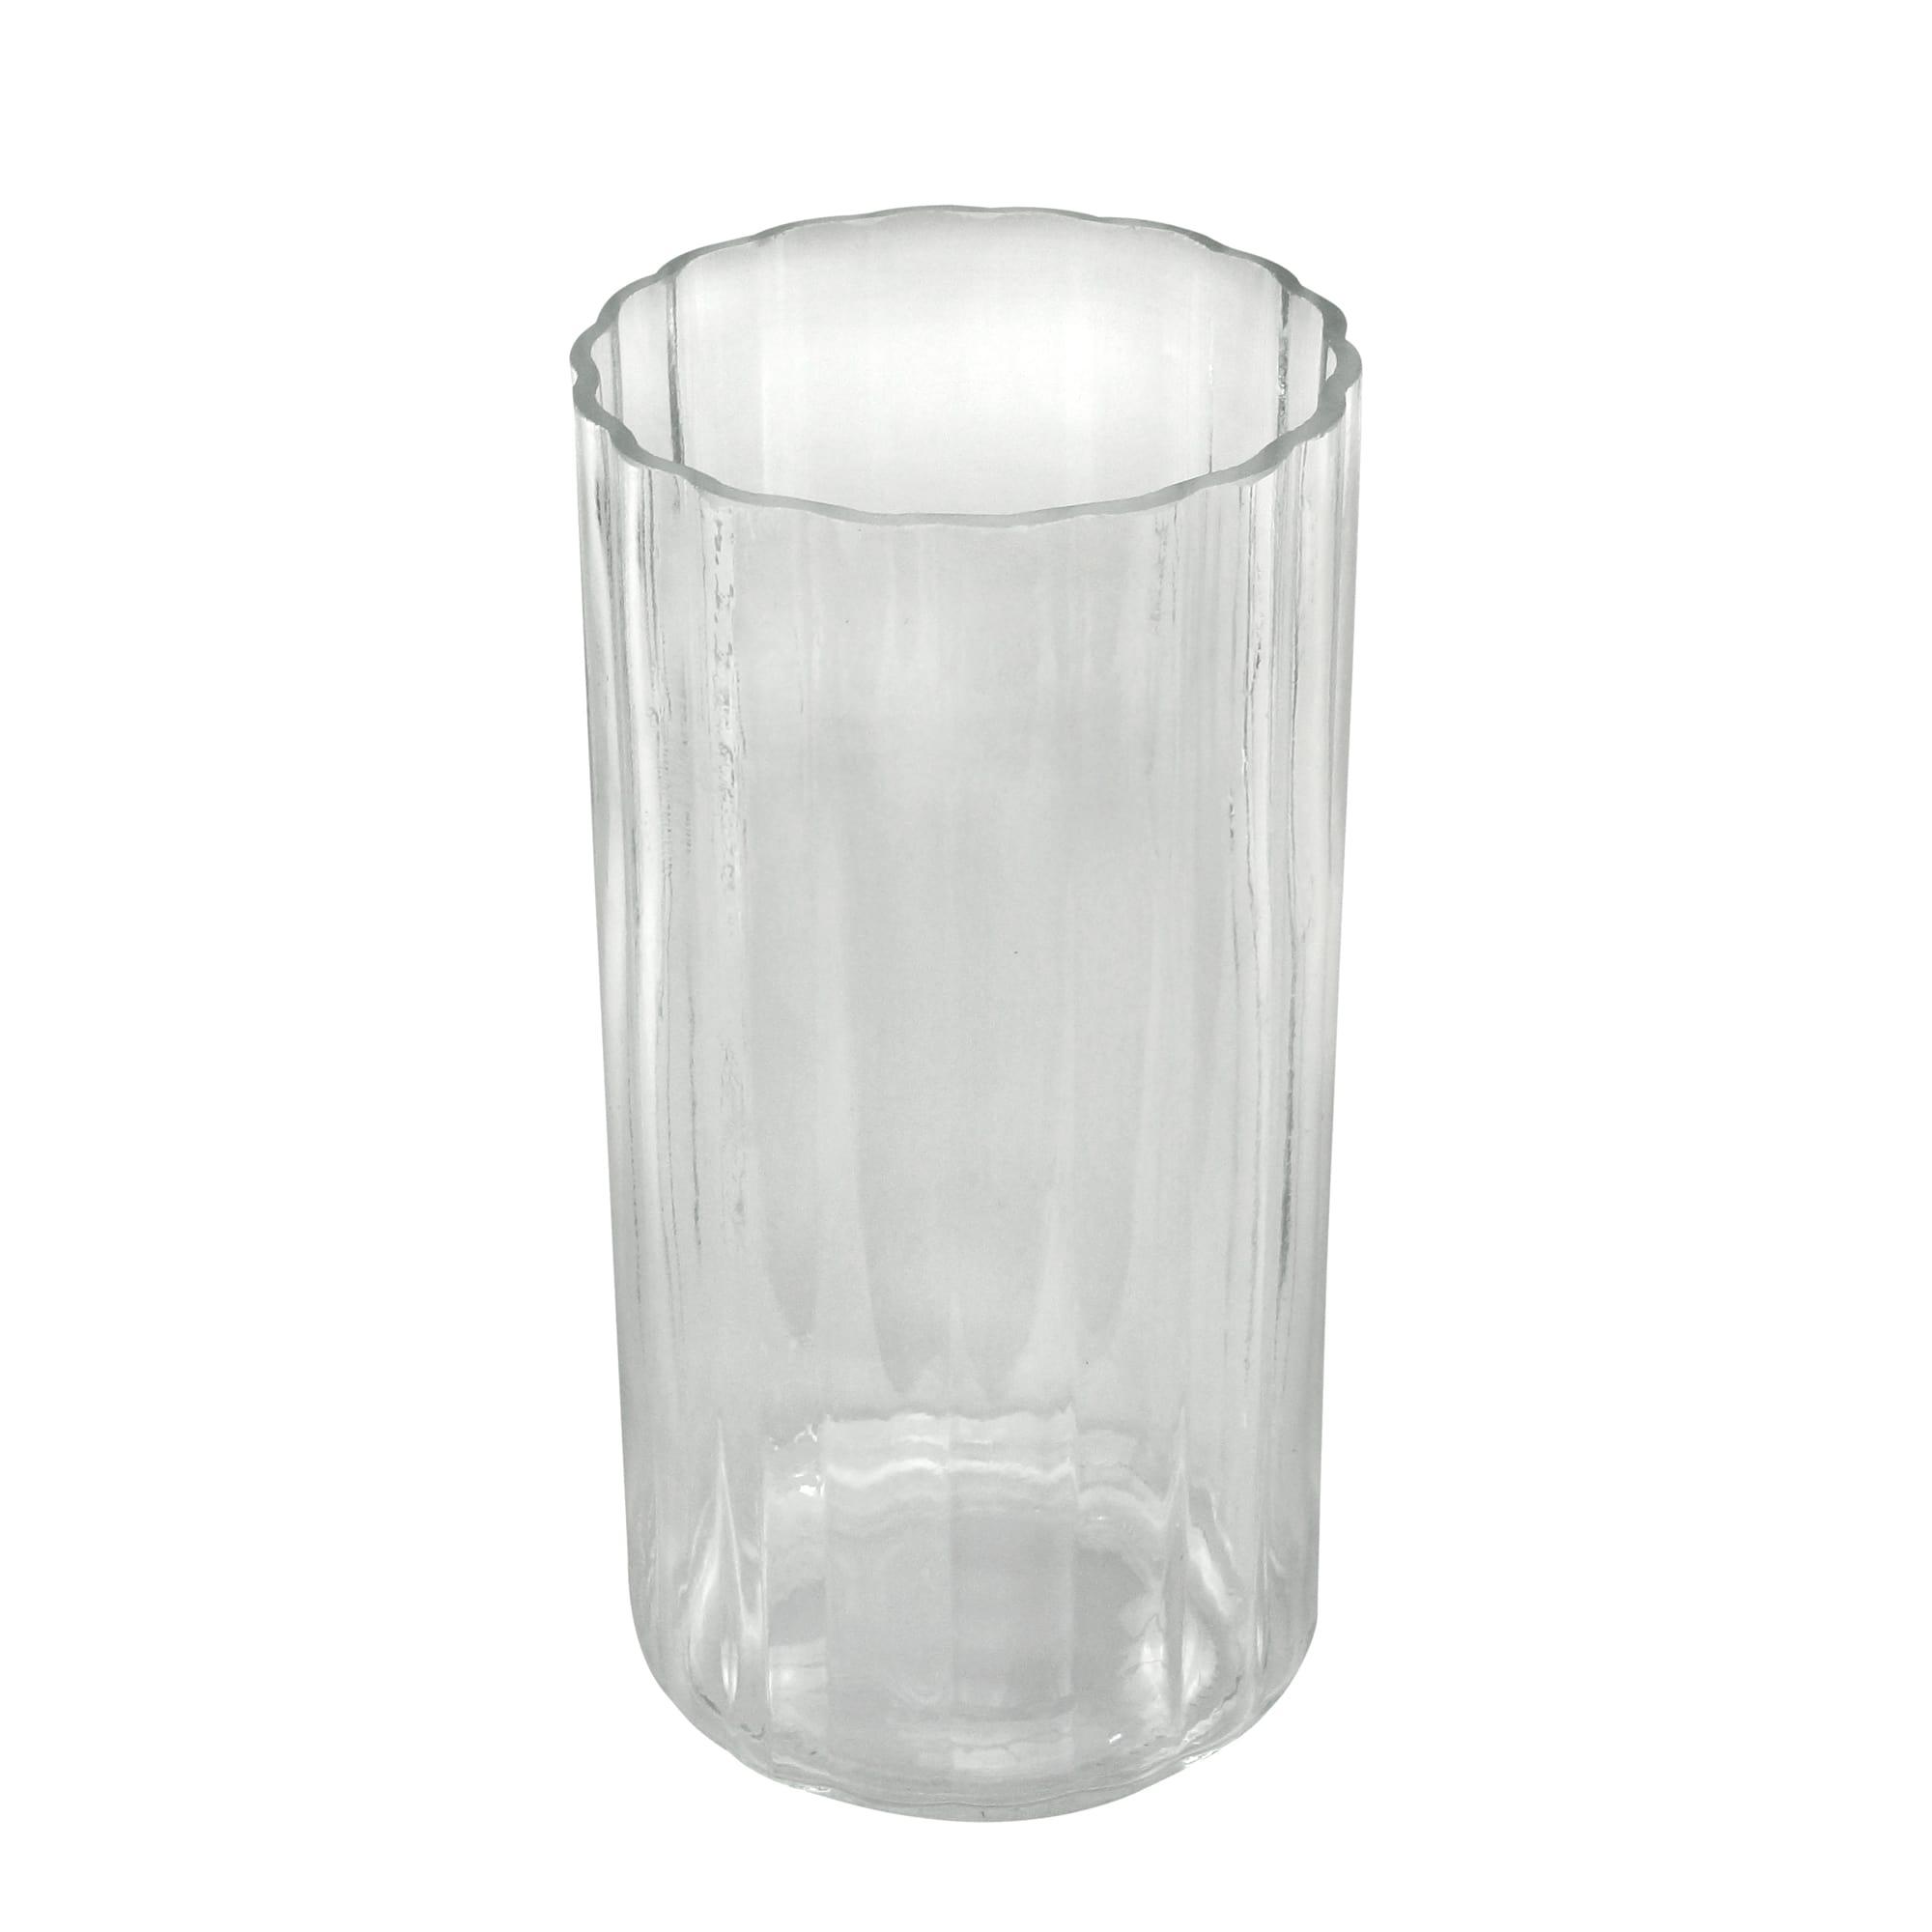 Vaso Vidro Transparente 11,6 x 11,6 x 23,8 cm